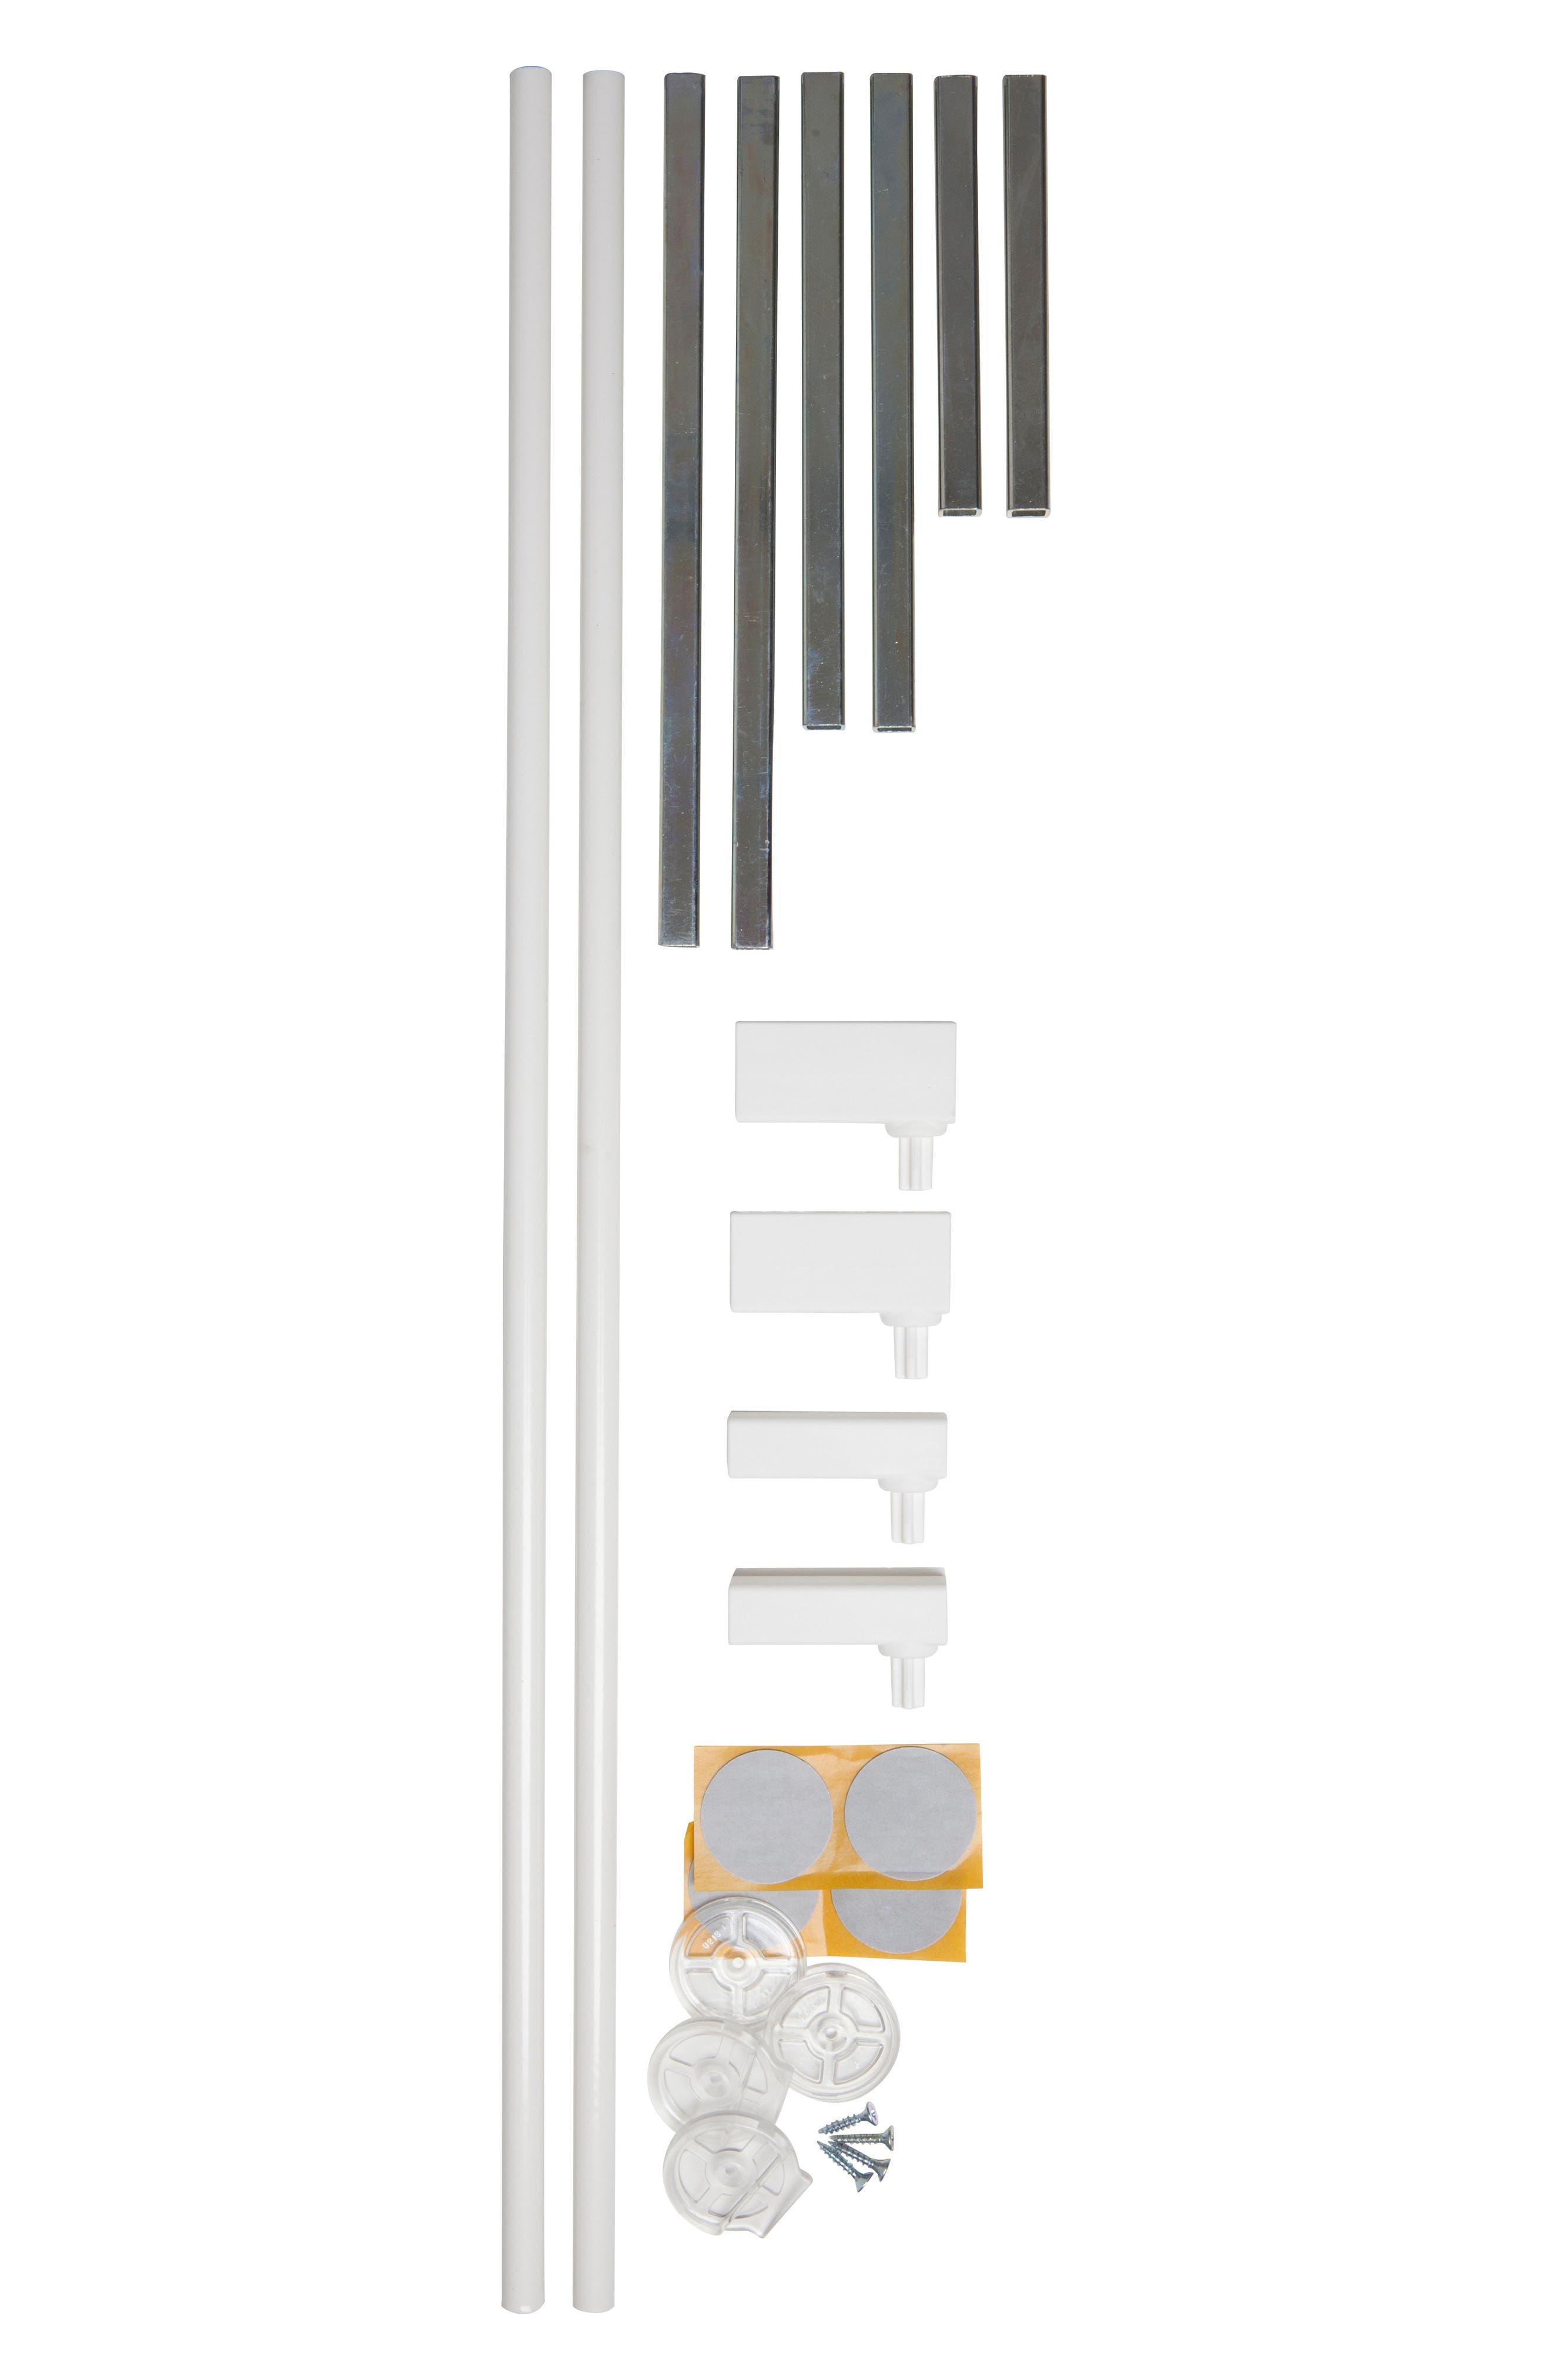 Premier Pressure Extend A Gate Kit,                             Main thumbnail 1, color,                             White